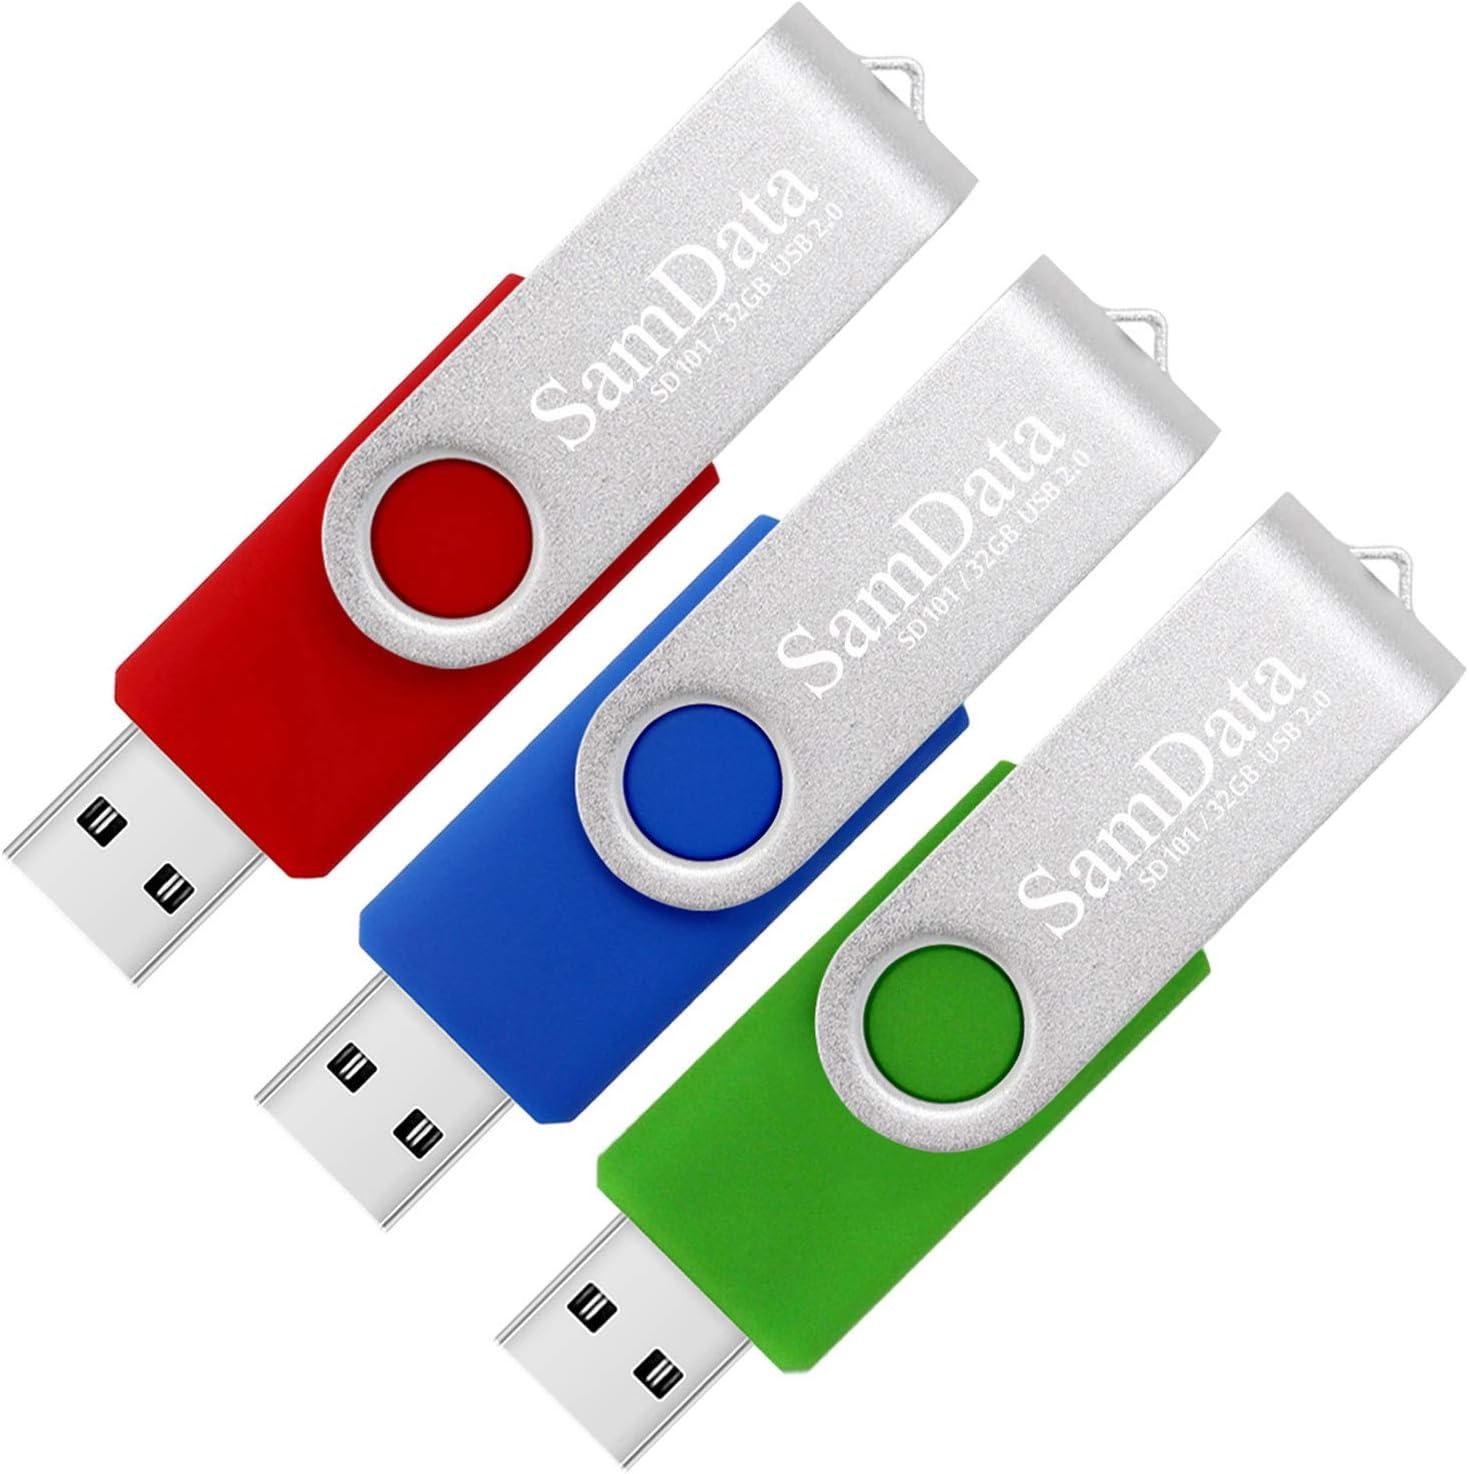 SamData USB 2.0 Raleigh Mall Flash Drive 32GB Swivel Memo Pack Ranking TOP11 3 Thumb